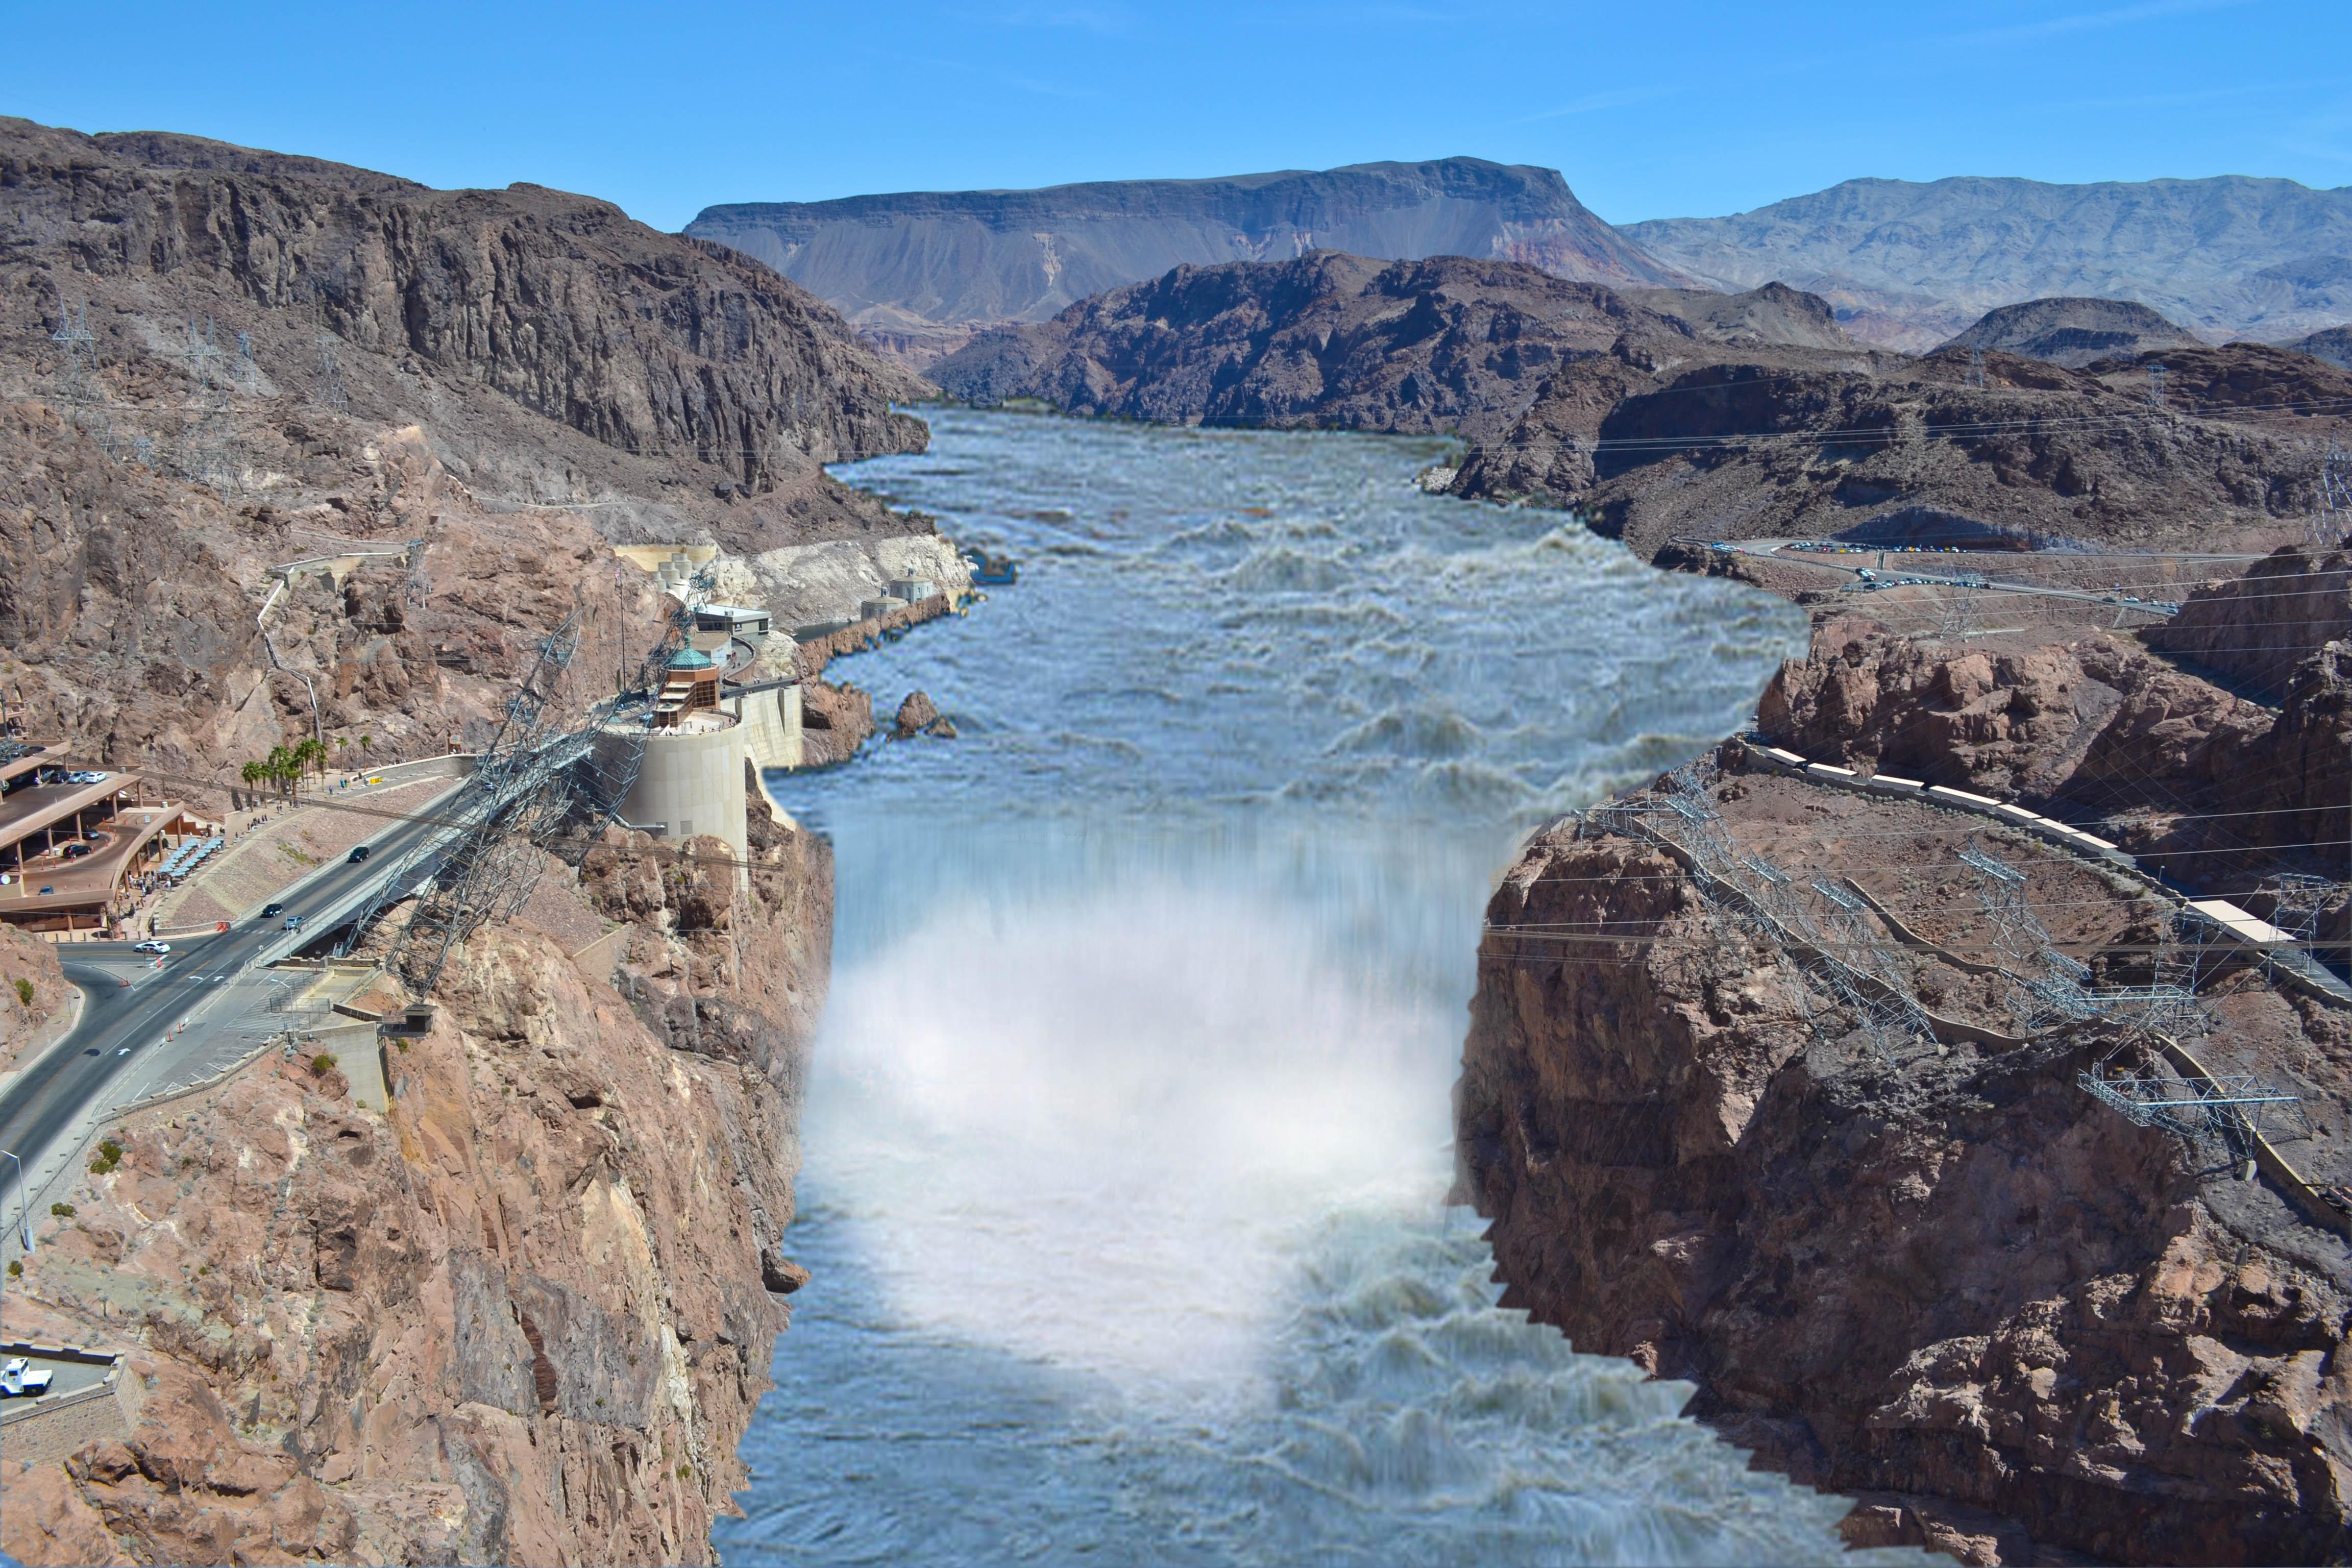 On The Colorado - Resources